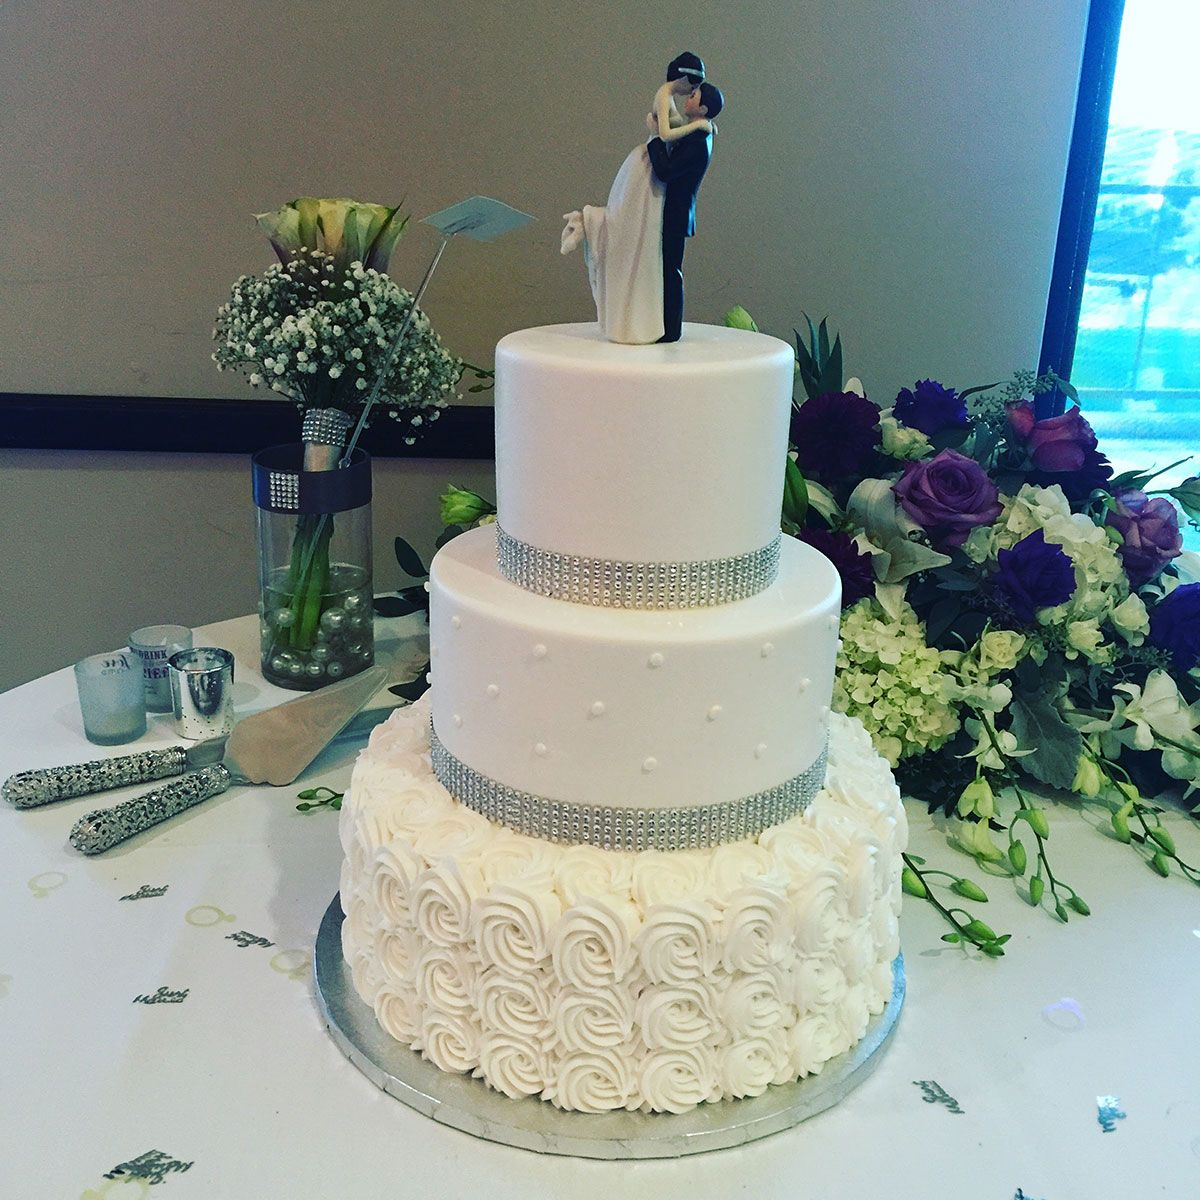 Pacific Patisserie - Custom Wedding Cakes Gallery